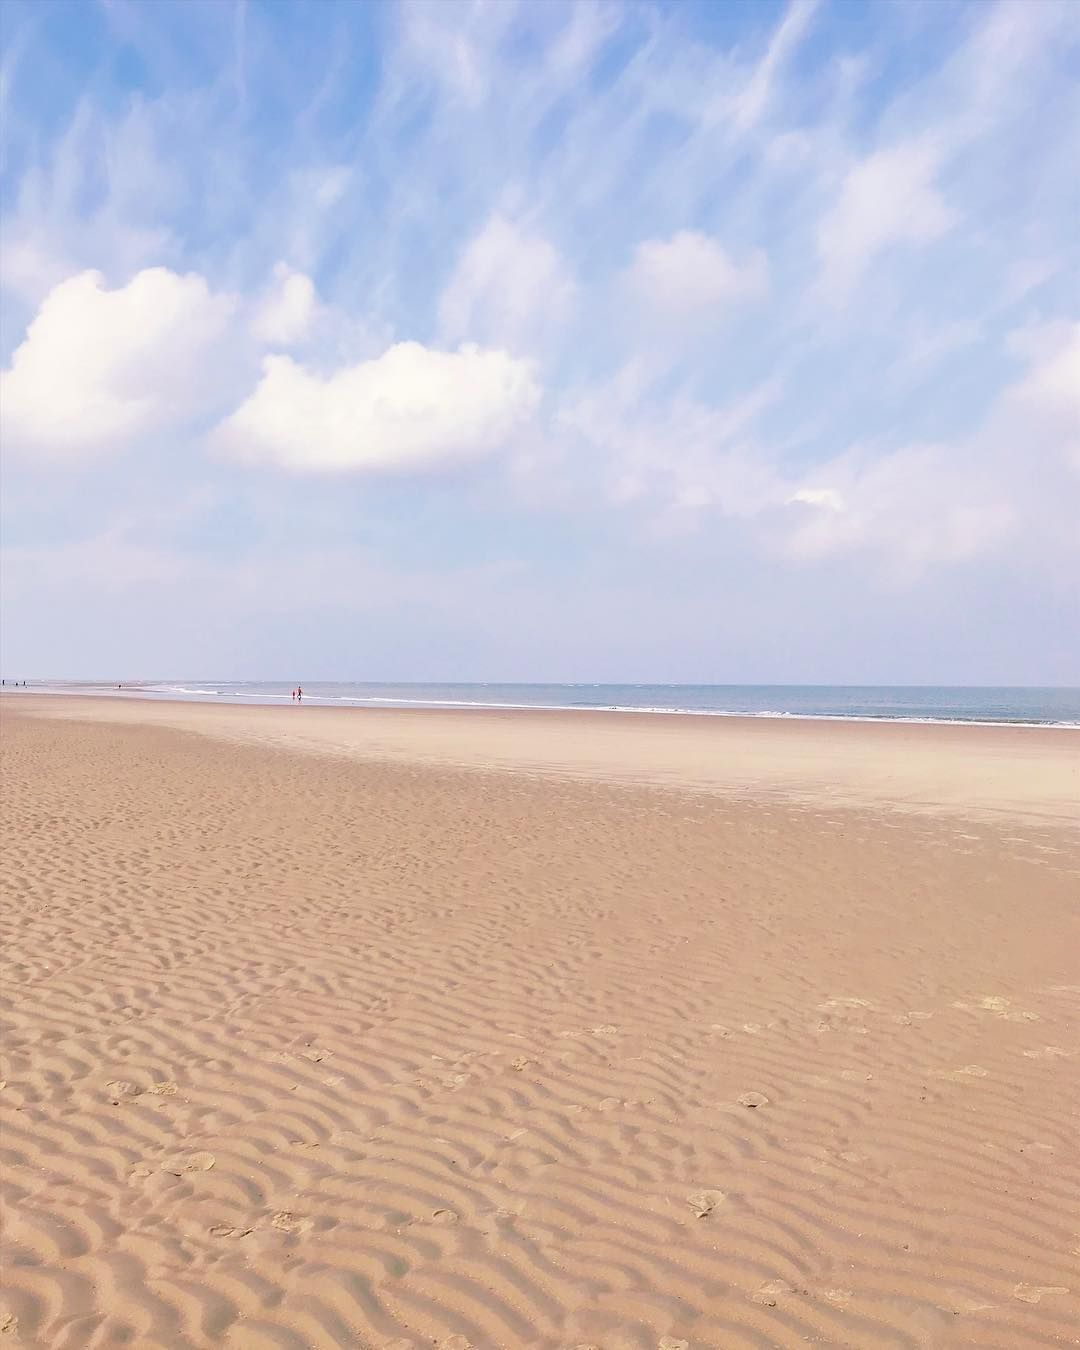 Nur Wolken Meer Und Rillen Im Sand Perfekt Meer Ocean Urlaub Osternammeer Nordsee Islandlife Travelgram Blue In 2020 Instagram Inspiration Instagram Outdoor